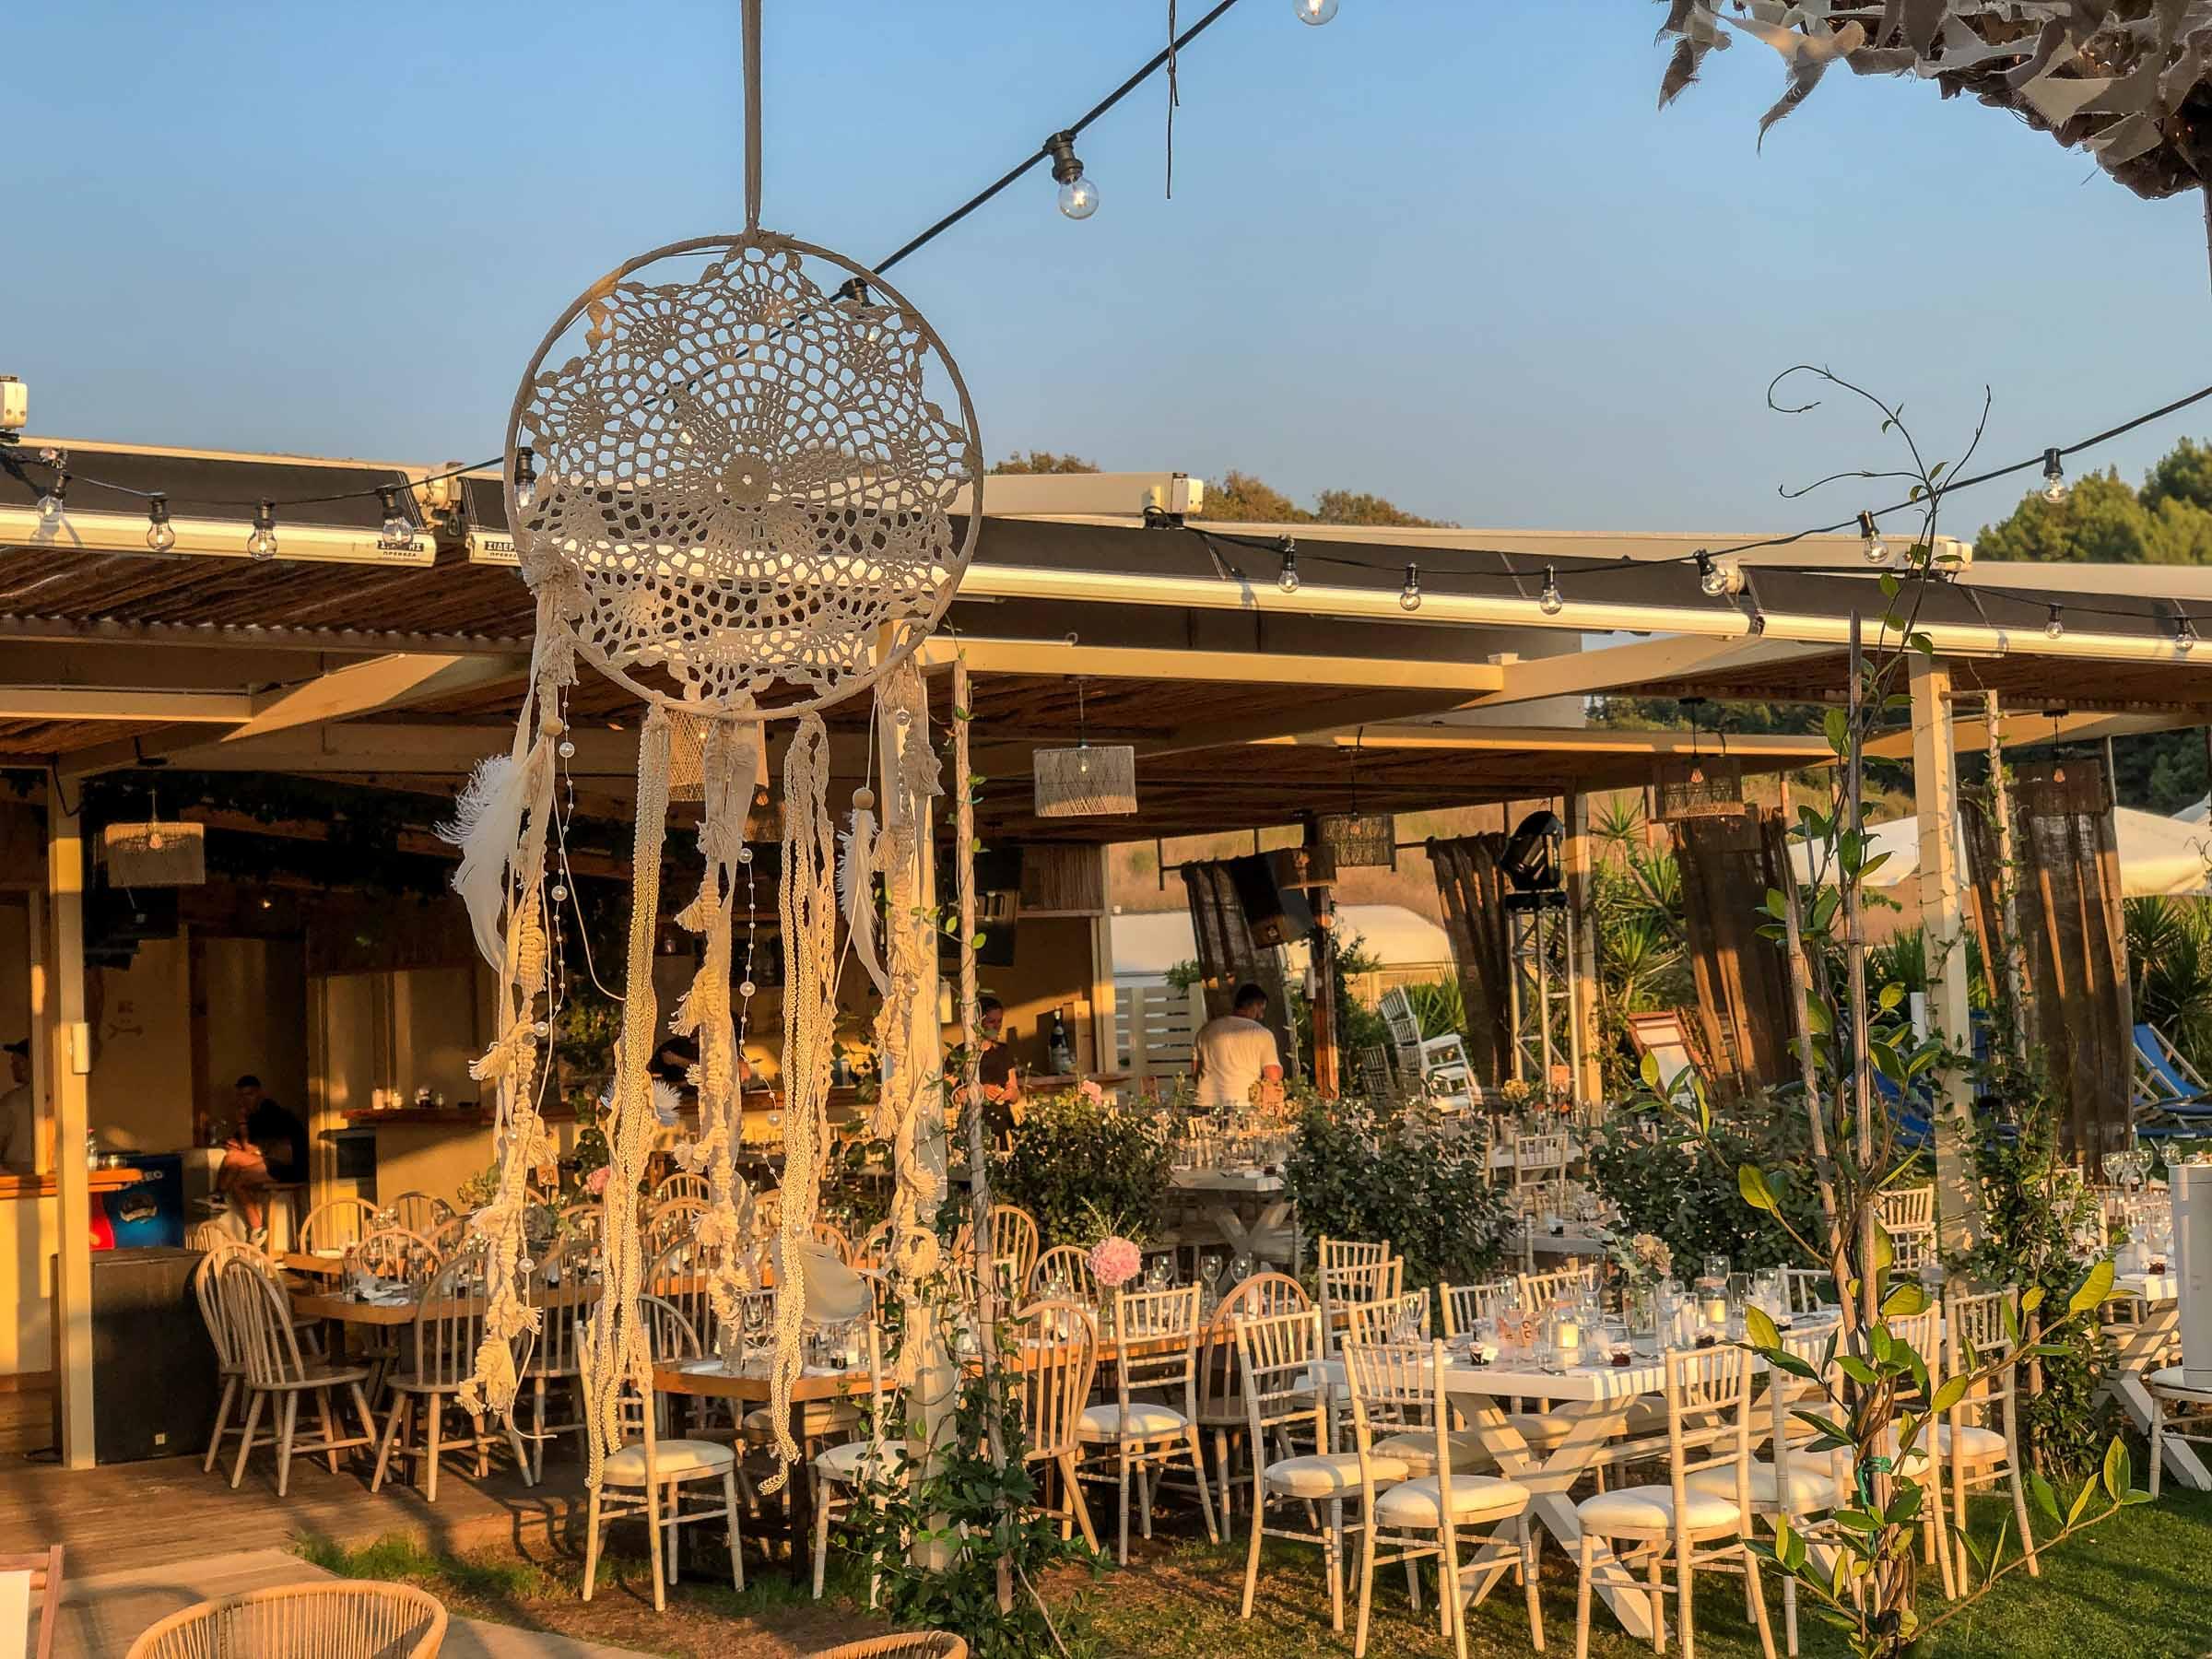 Decor in wedding event